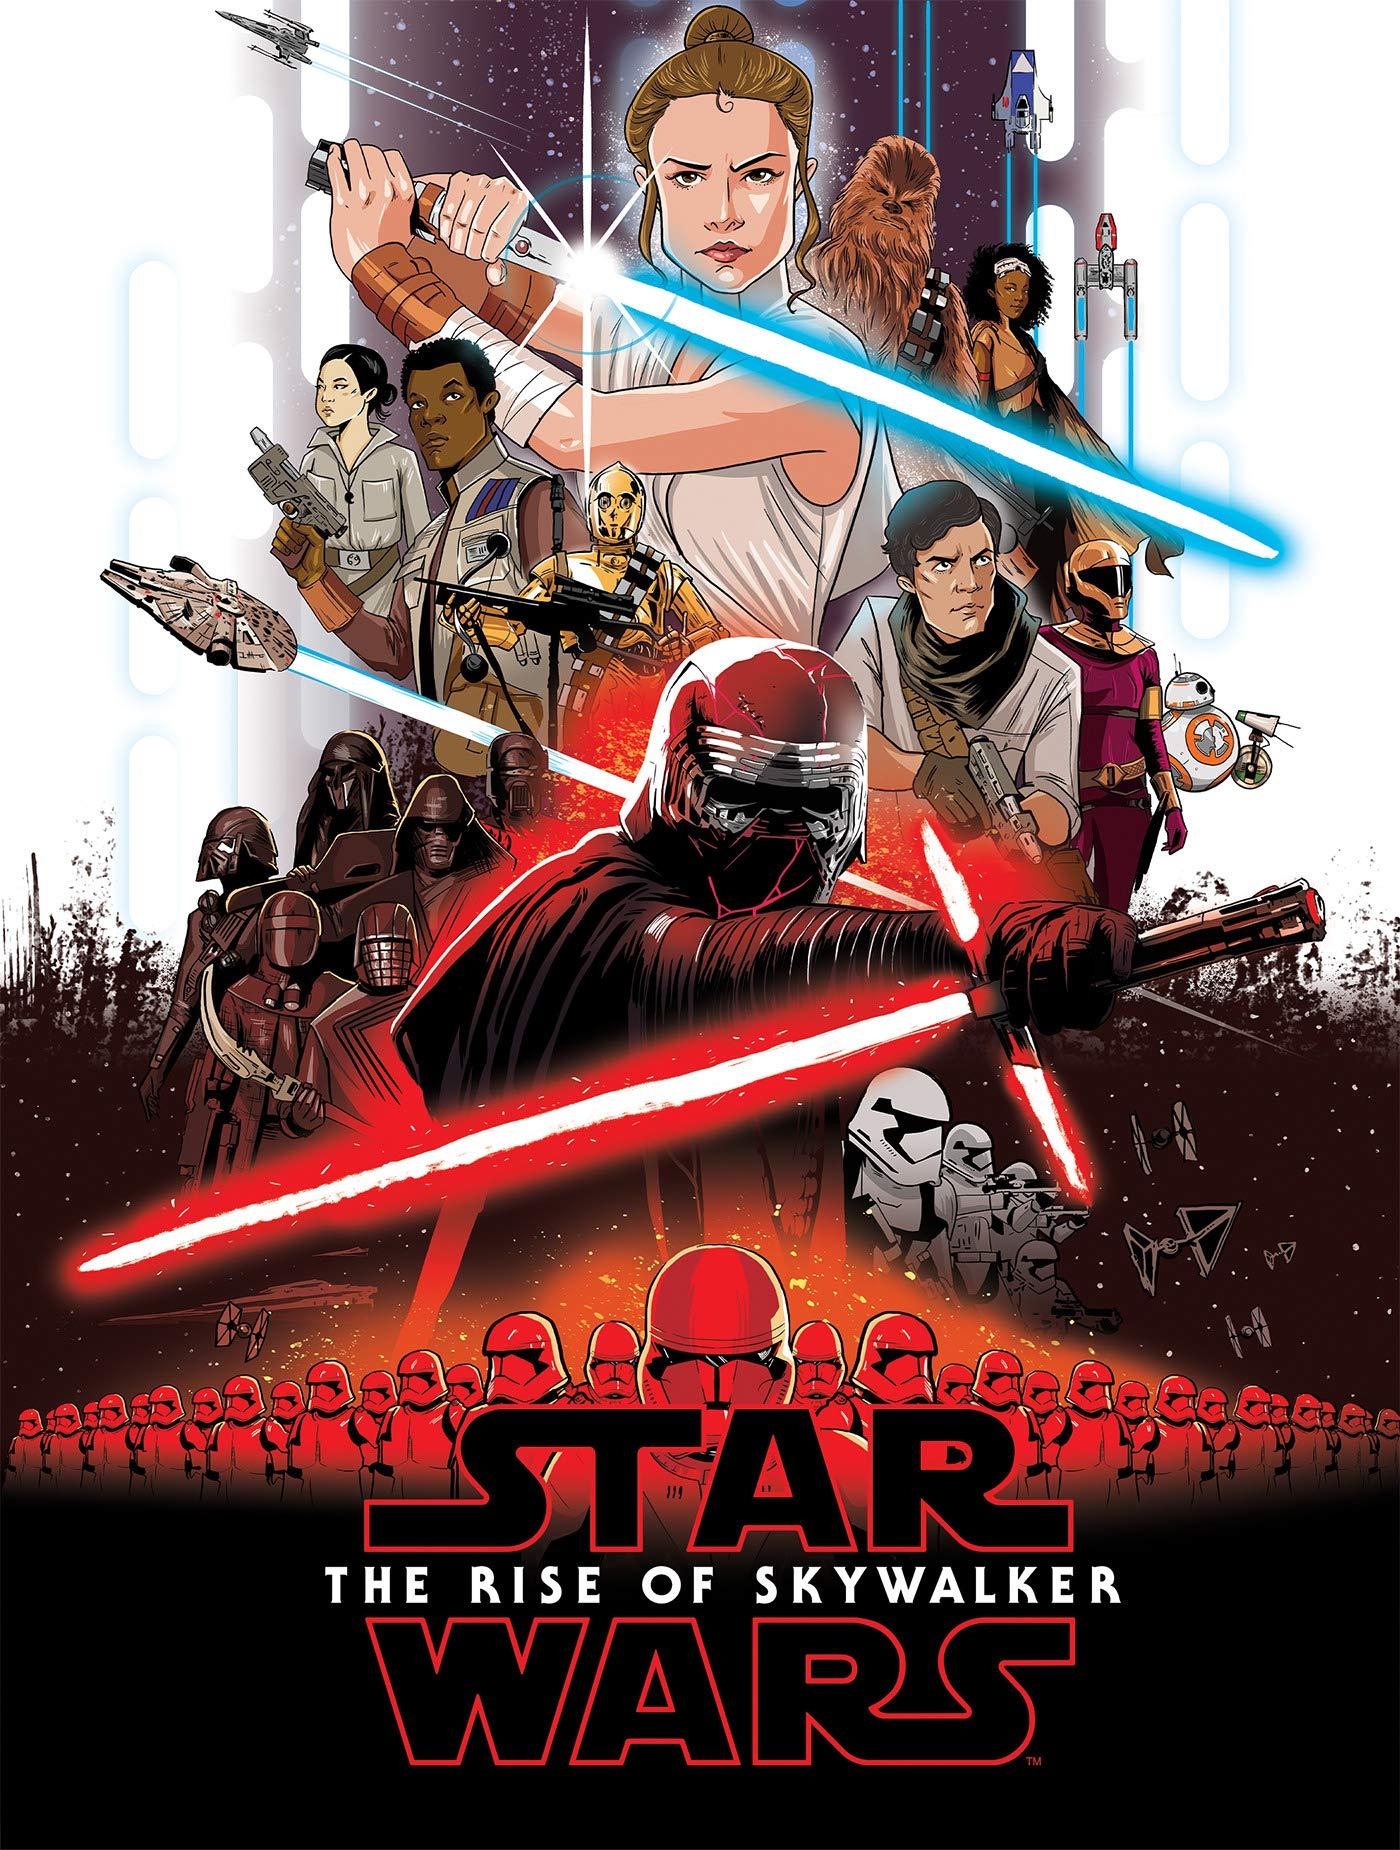 Amazon Com Star Wars The Rise Of Skywalker Graphic Novel Adaptation Star Wars Movie Adaptations 9781684056866 Ferrari Alessandro Books